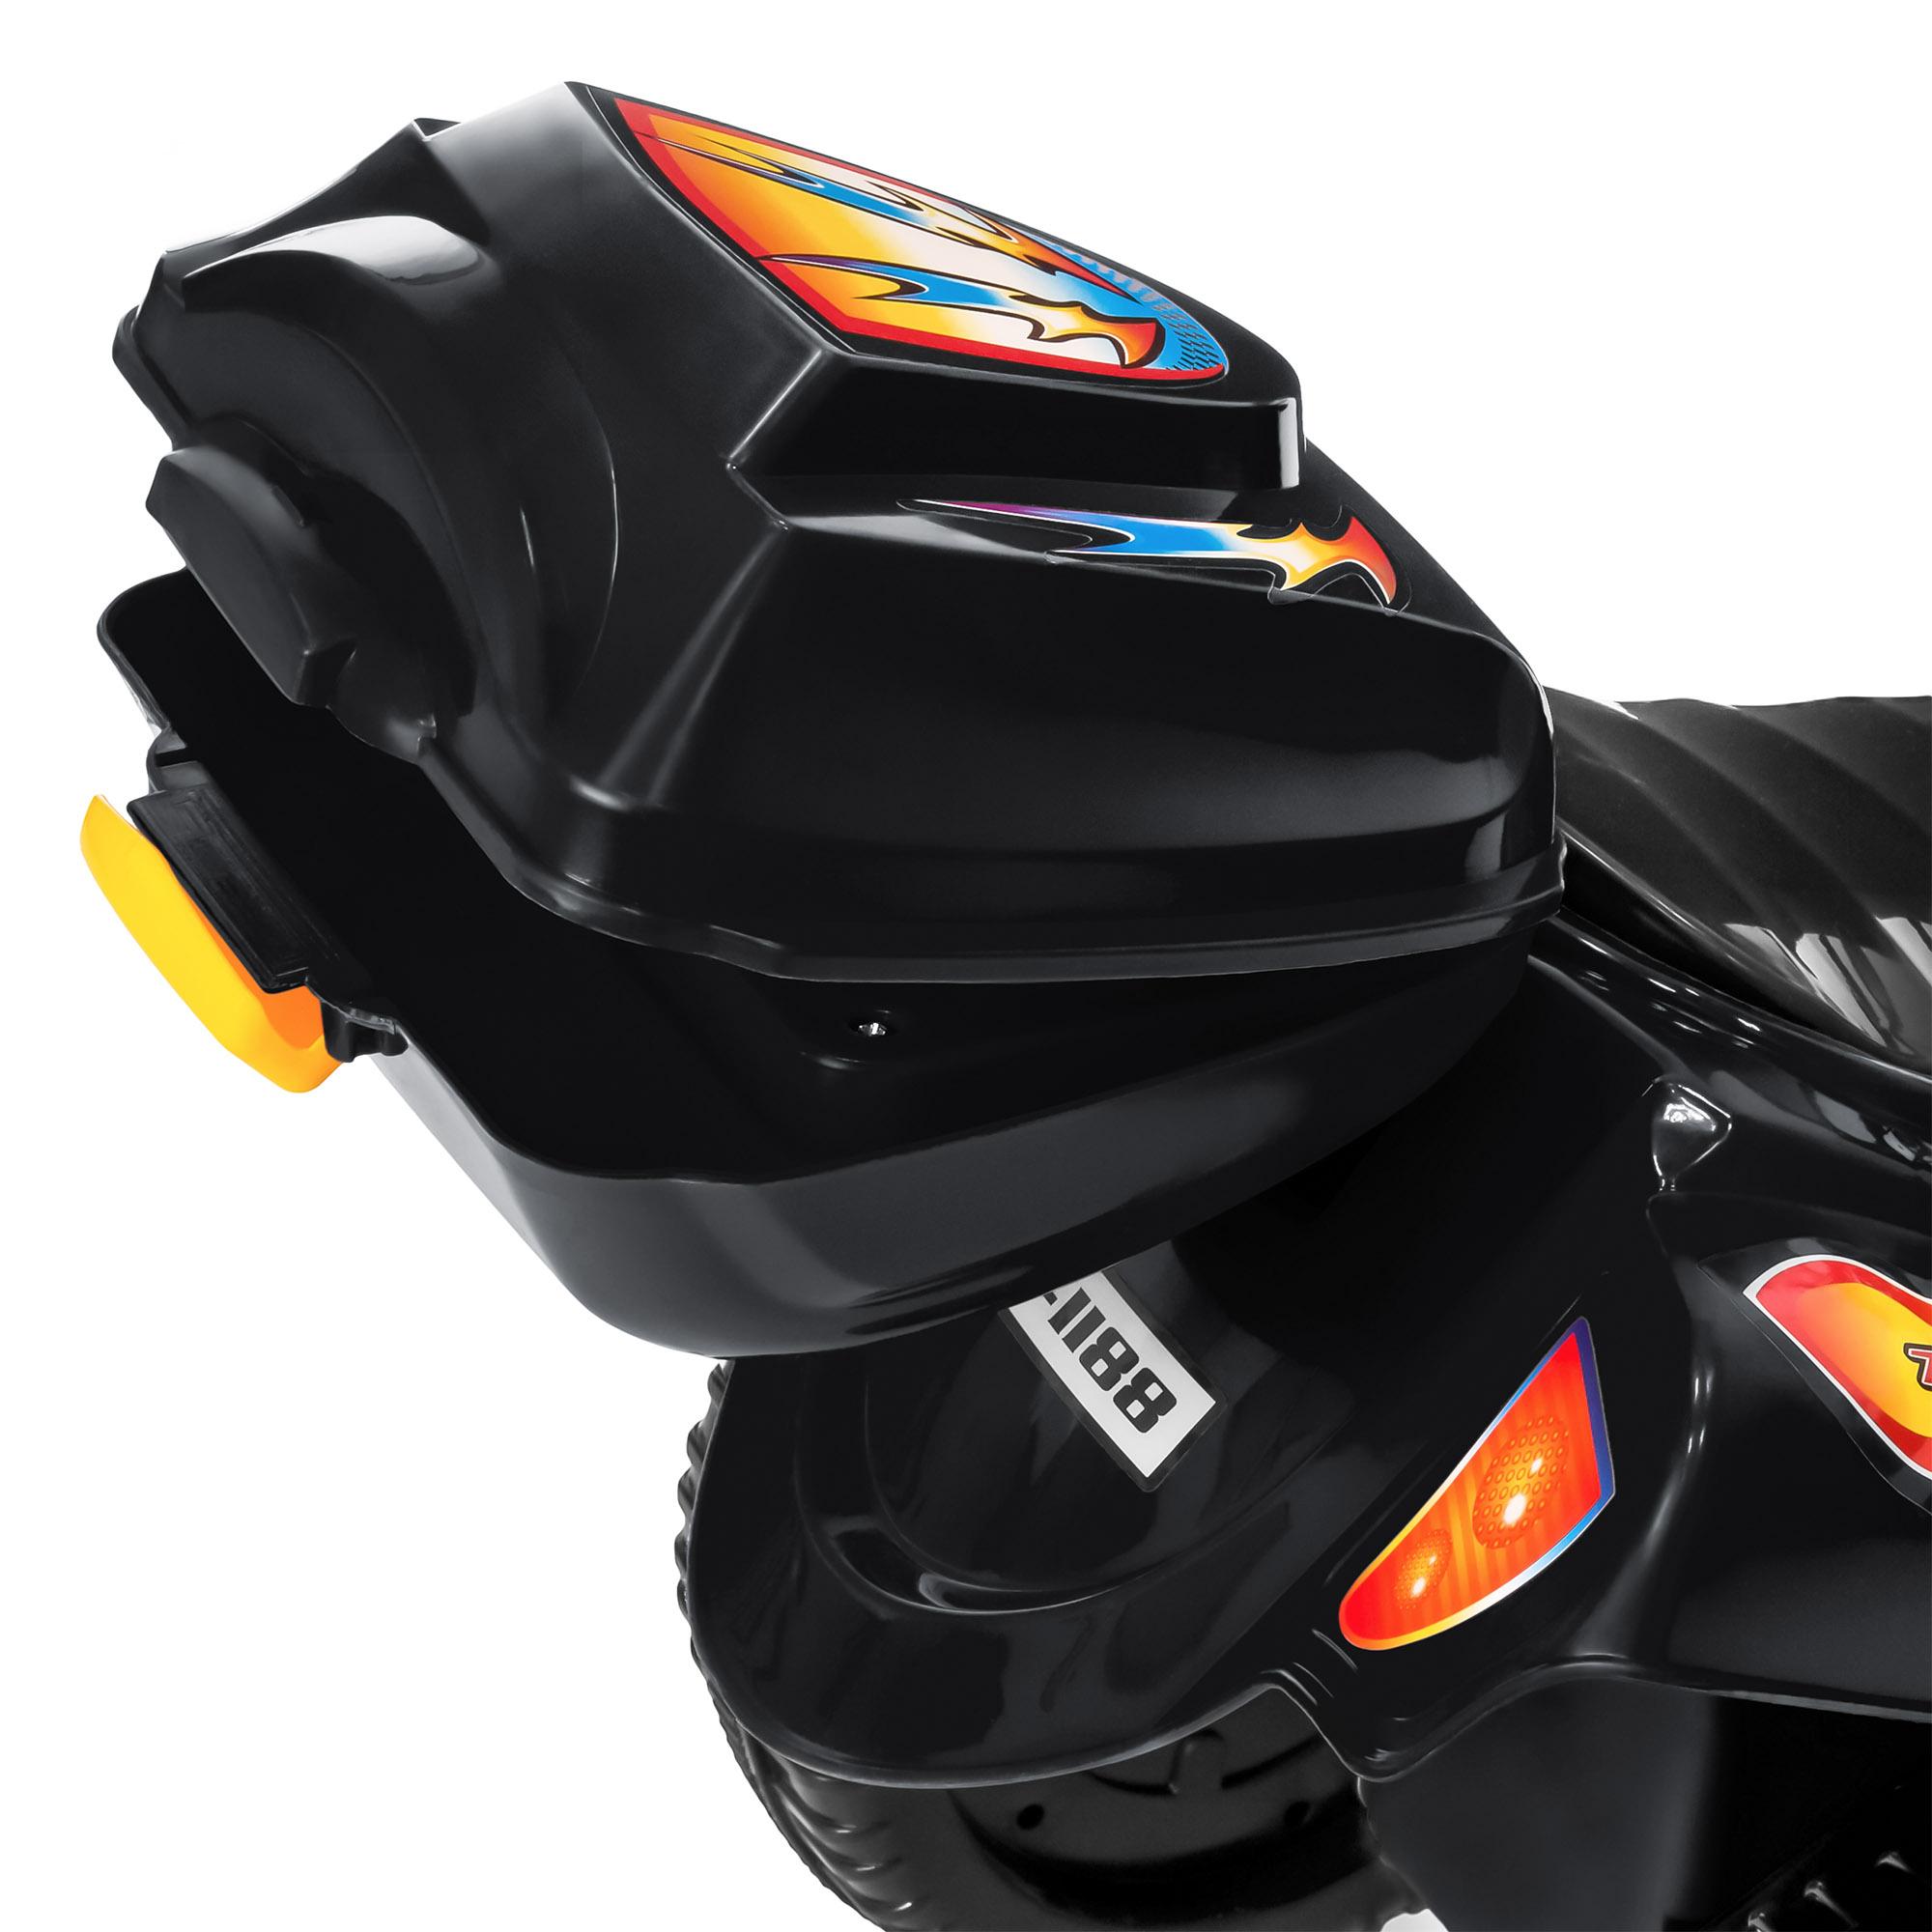 BCP-6V-Kids-3-Wheel-Motorcycle-Ride-On-Toy-w-LED-Lights-Music-Storage thumbnail 10